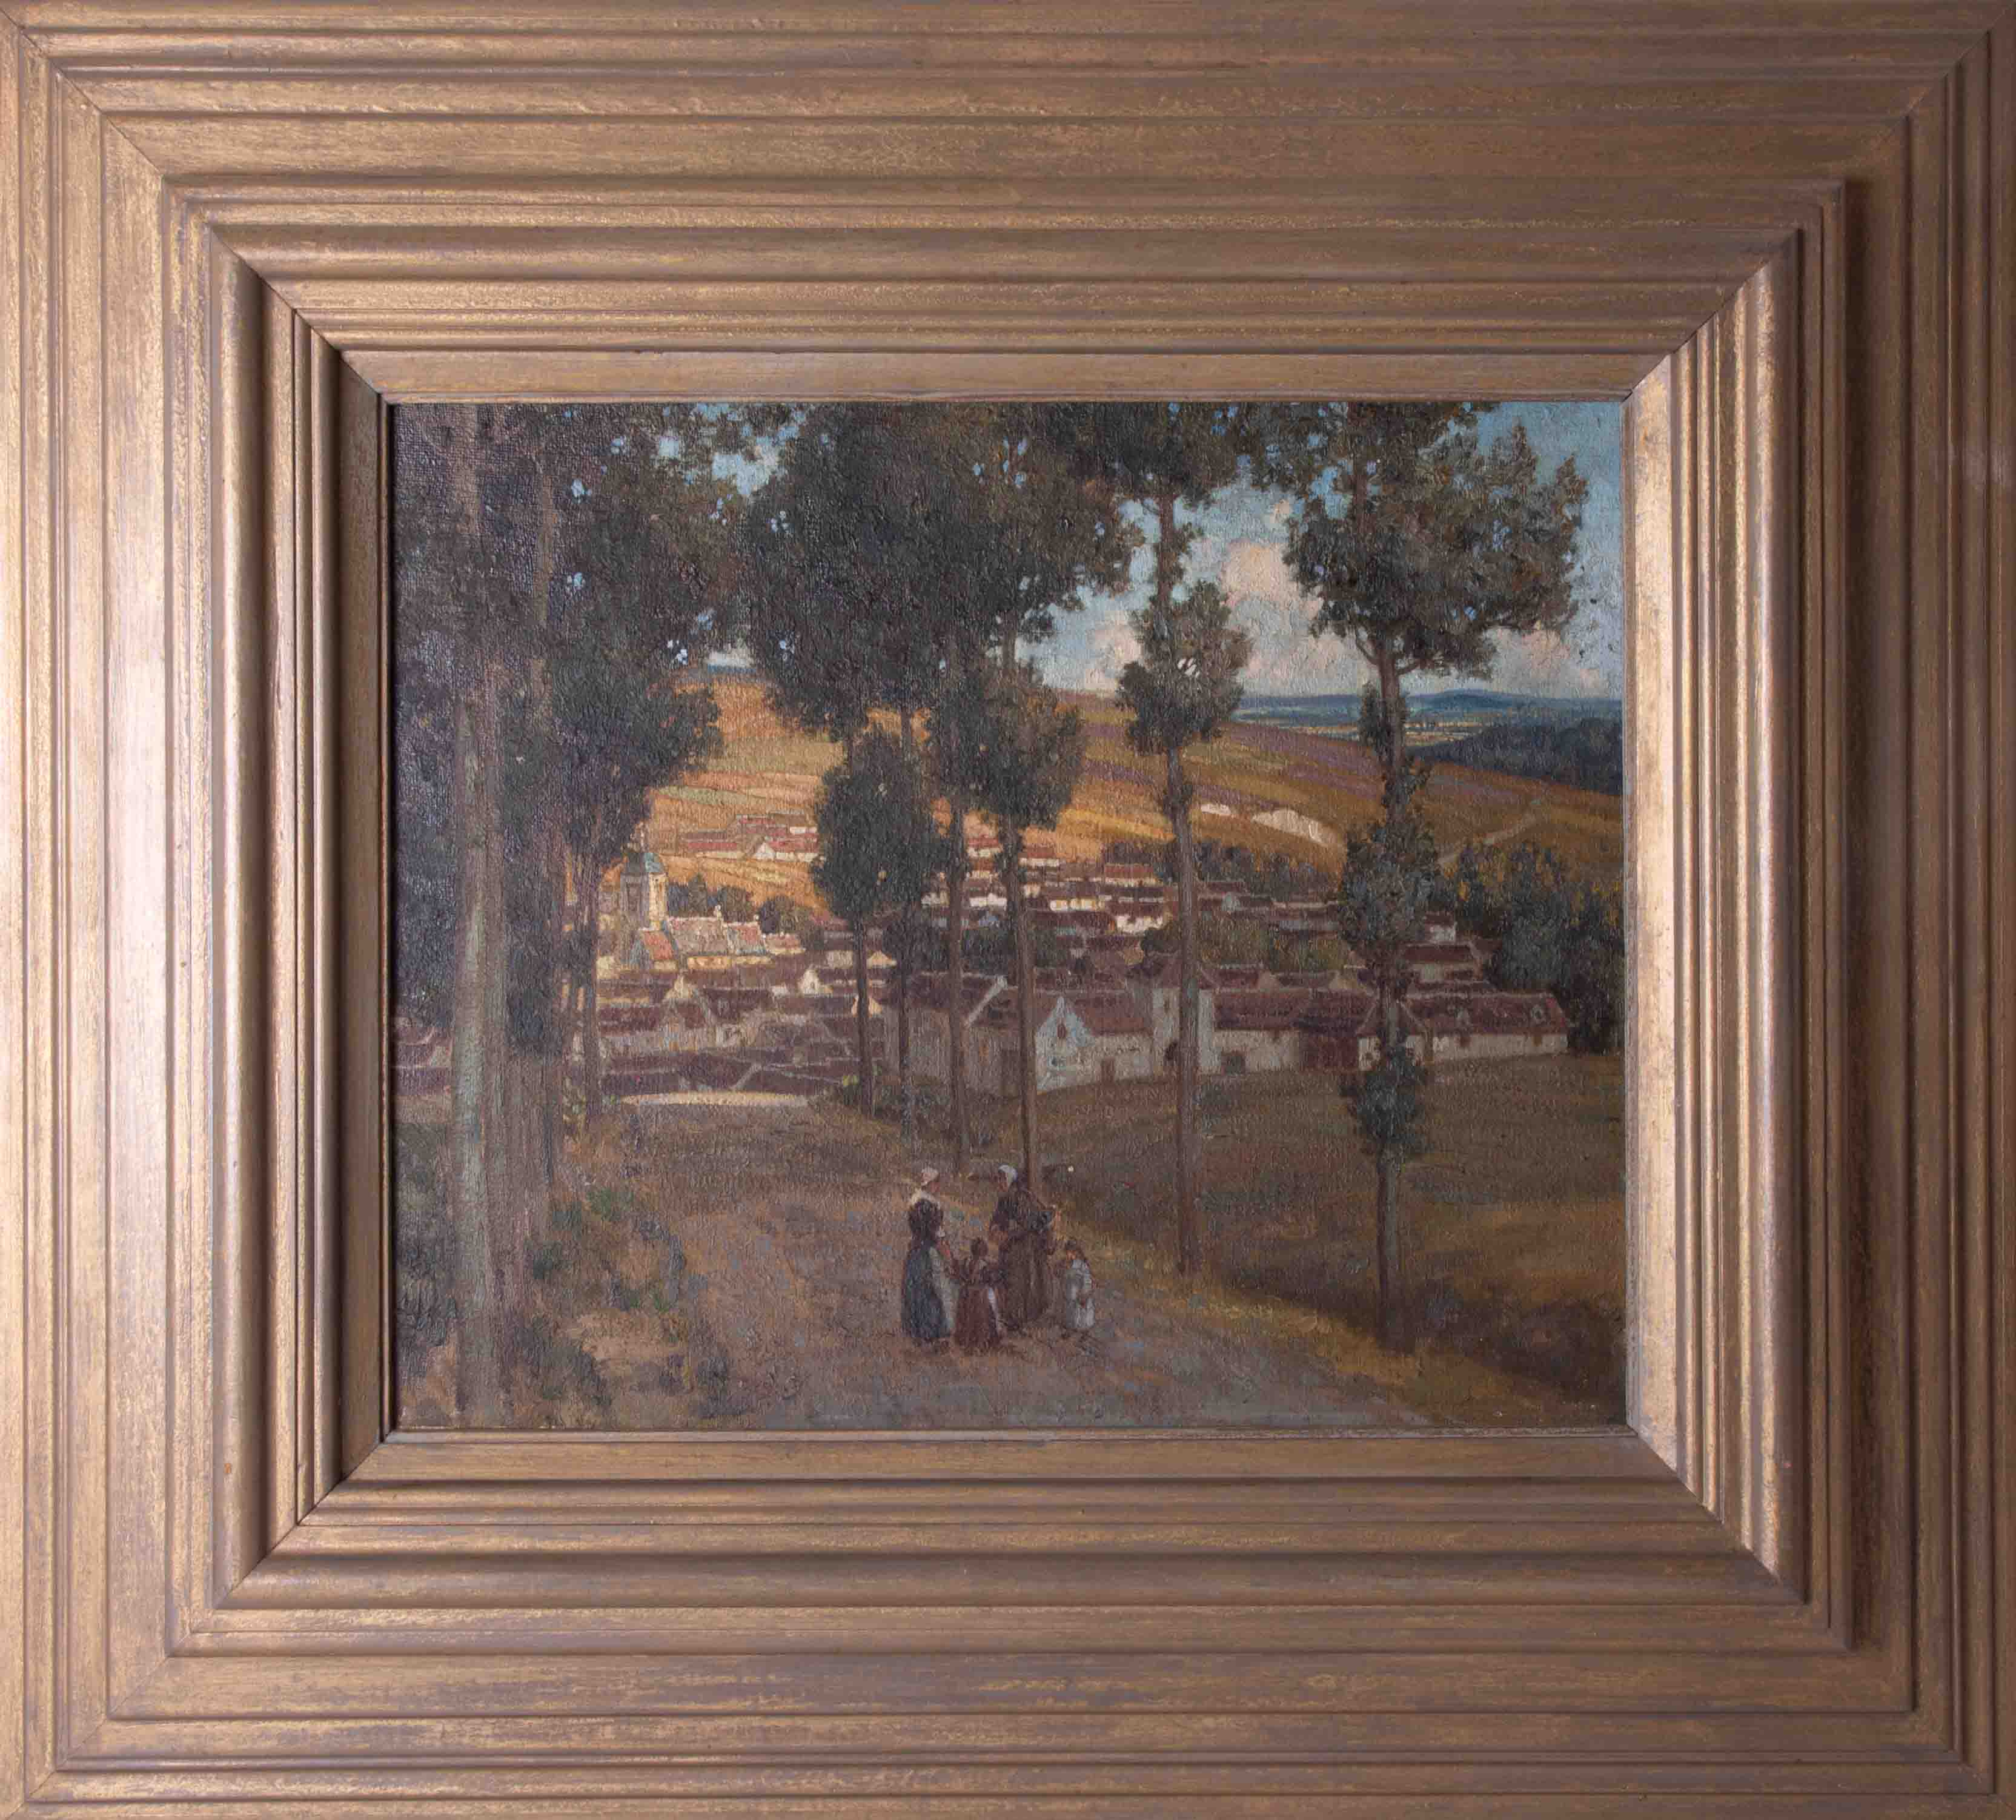 Unsigned oil on board 'Village', 36cm x 44cm, framed.